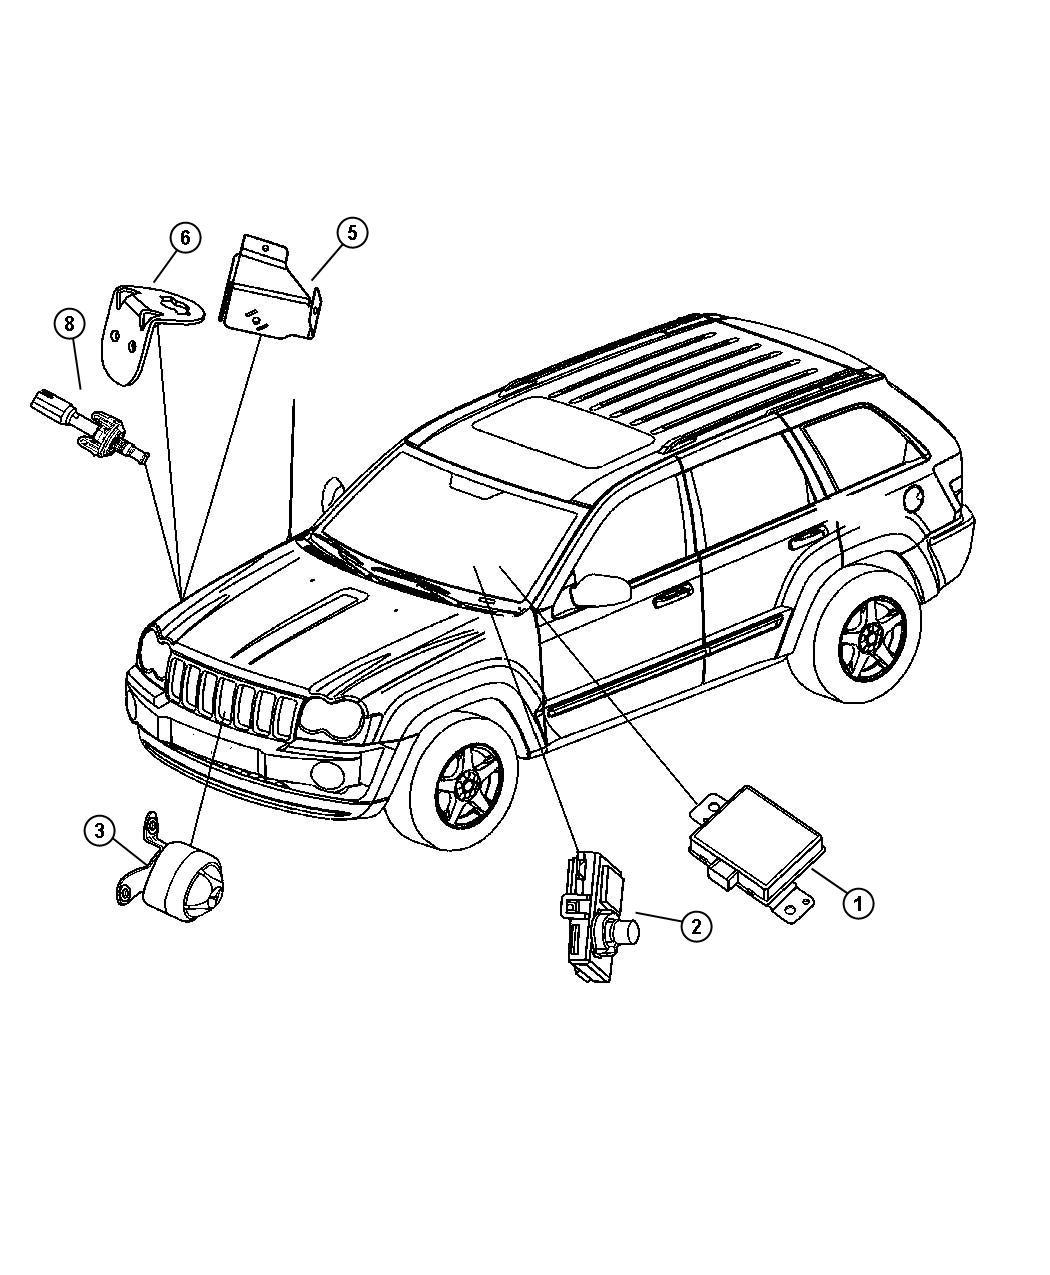 2013 Dodge Grand Caravan SE 3.6L V6 Transmitter. Anti